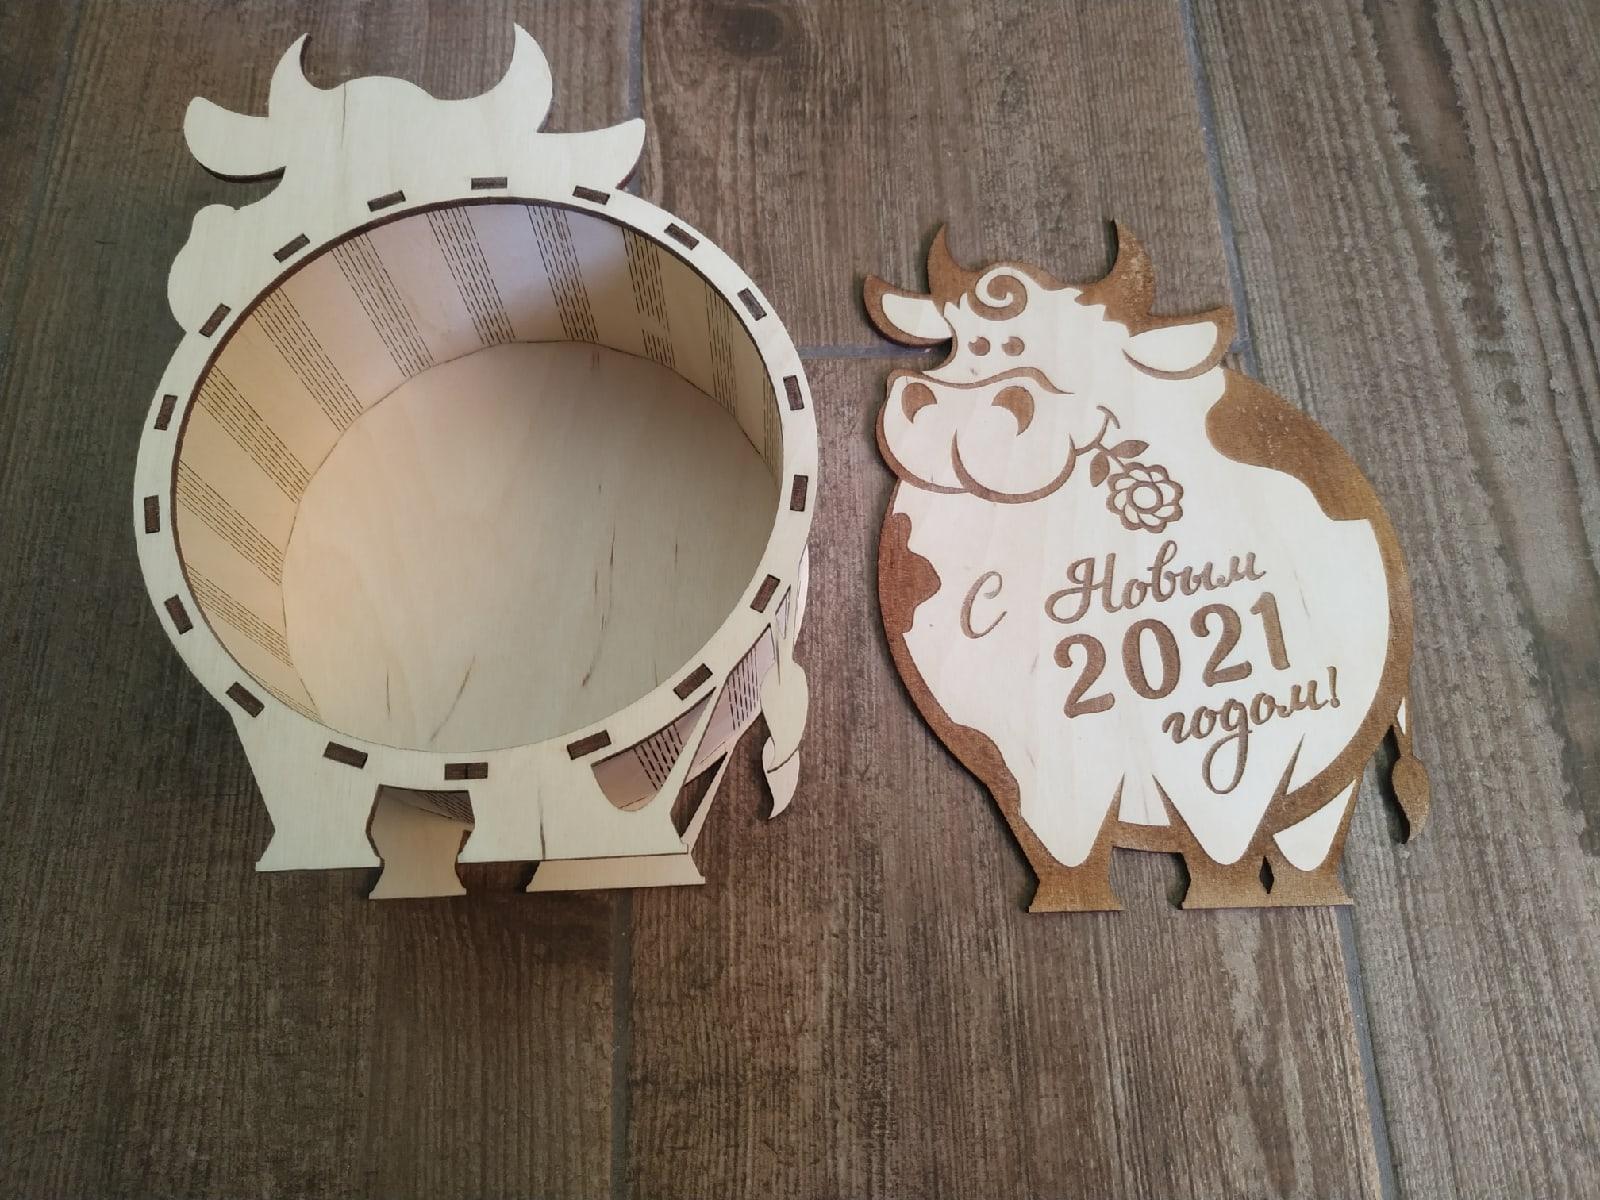 Laser Cut Bull New Year 2021 Gift Box New Years Eve Box Free CDR Vectors Art